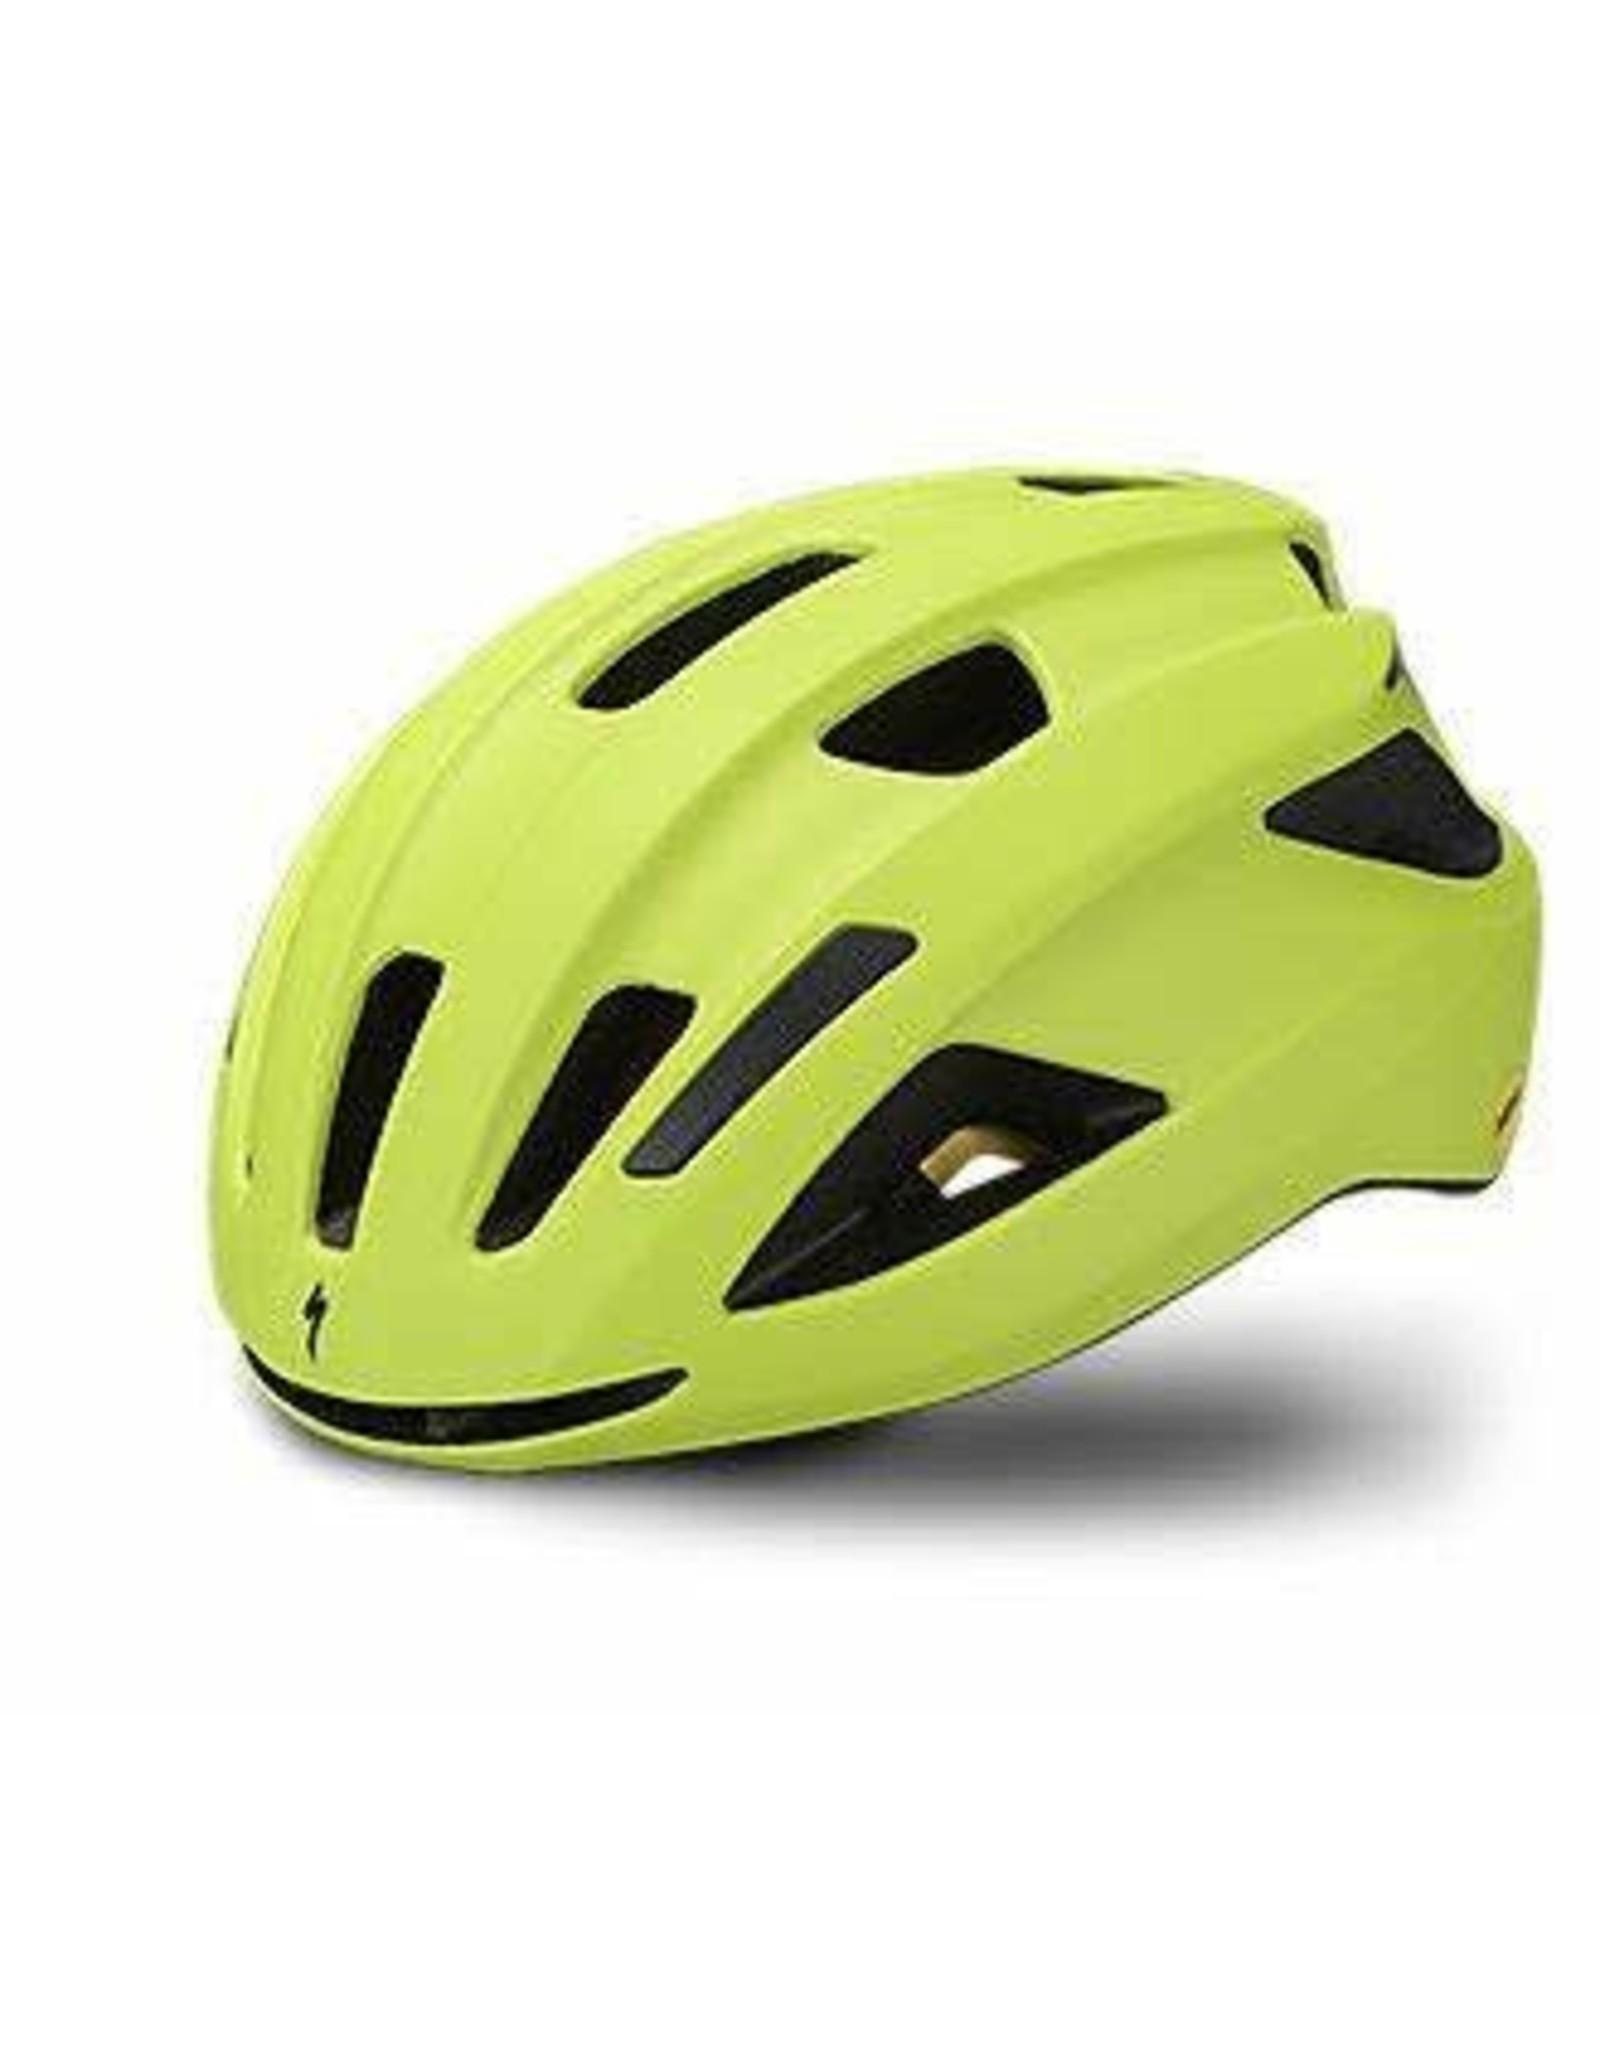 Specialized Helmet Spec Align II MIPS Hyper/Blk XL